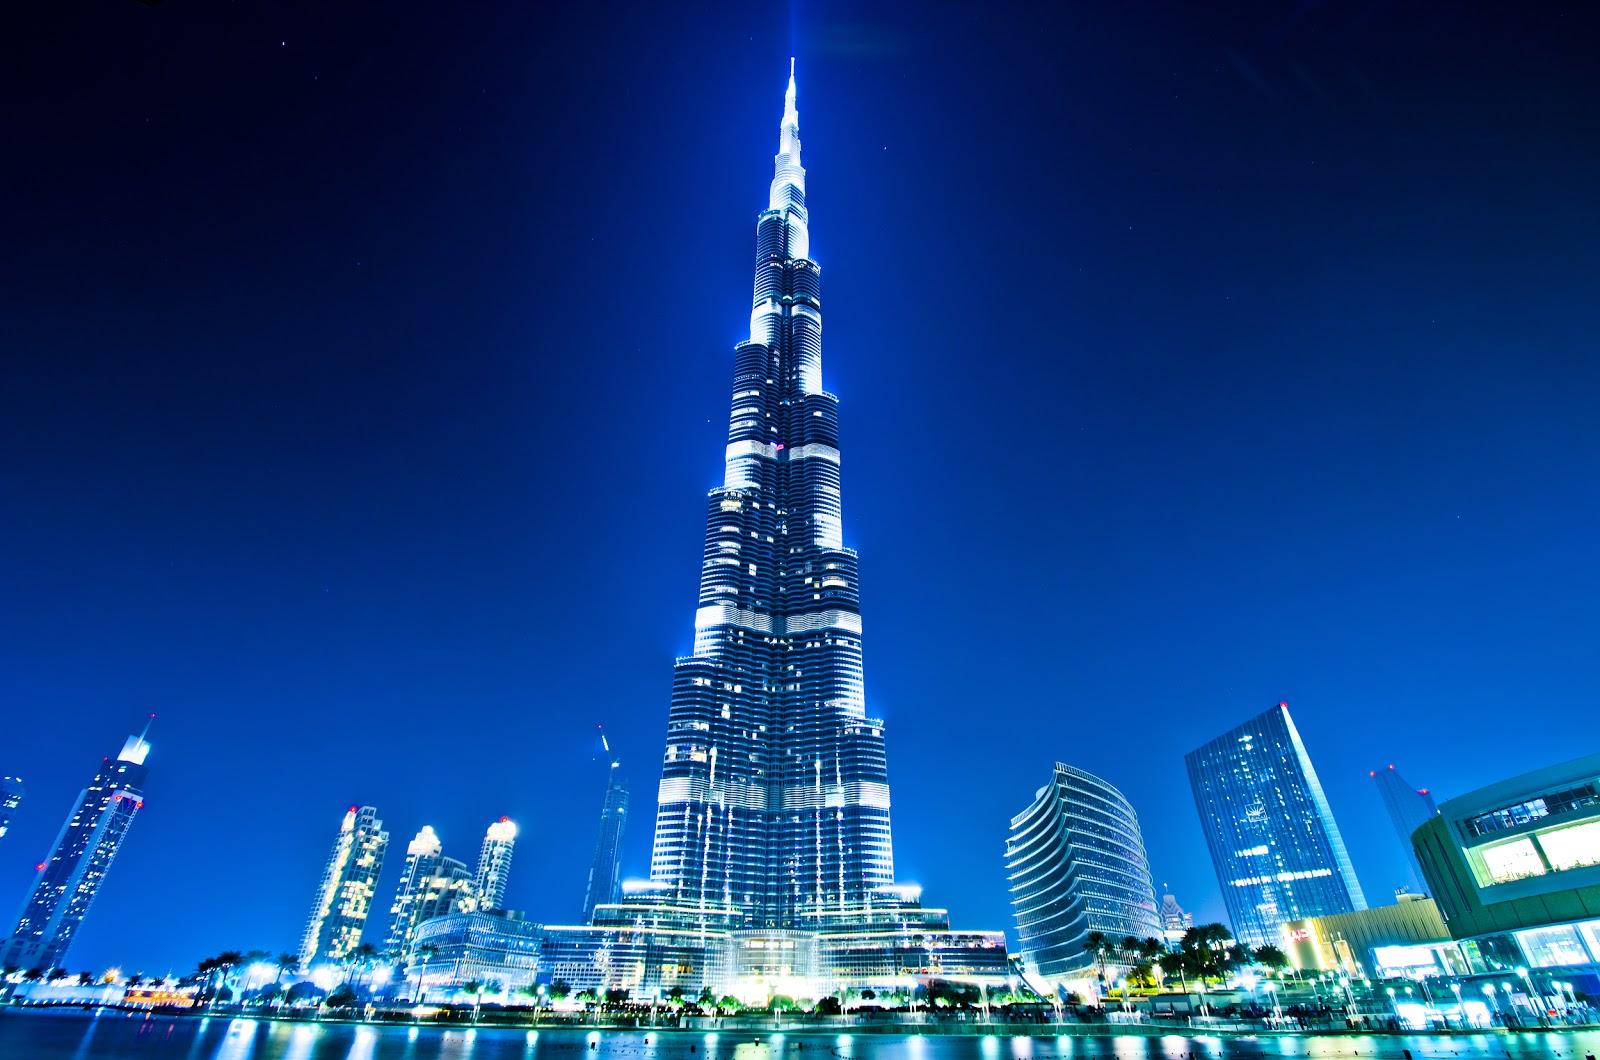 Worlds Tallest Building Burj Khalifa Dubai At Night